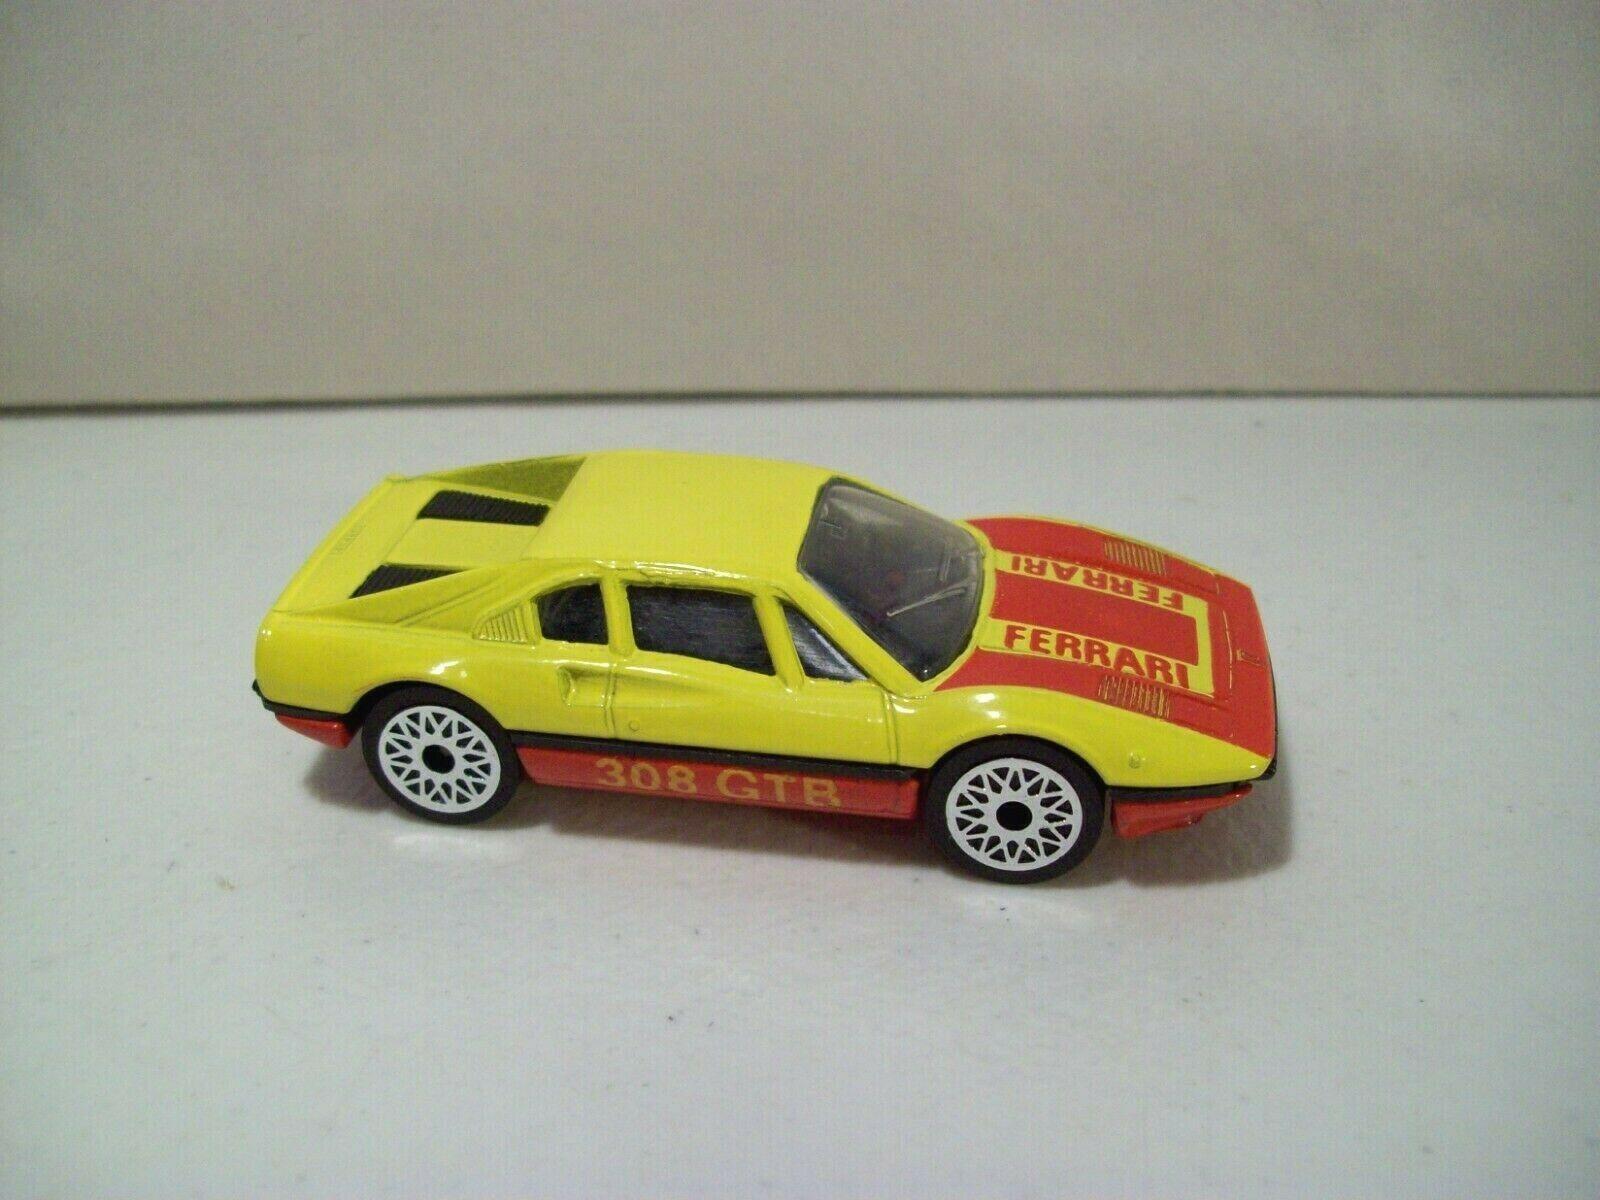 VINTAGE MATCHBOX FERRARI 308 GTB DIE-CAST CAR 1/55 SCALE YELLOW 1981 - $14.65